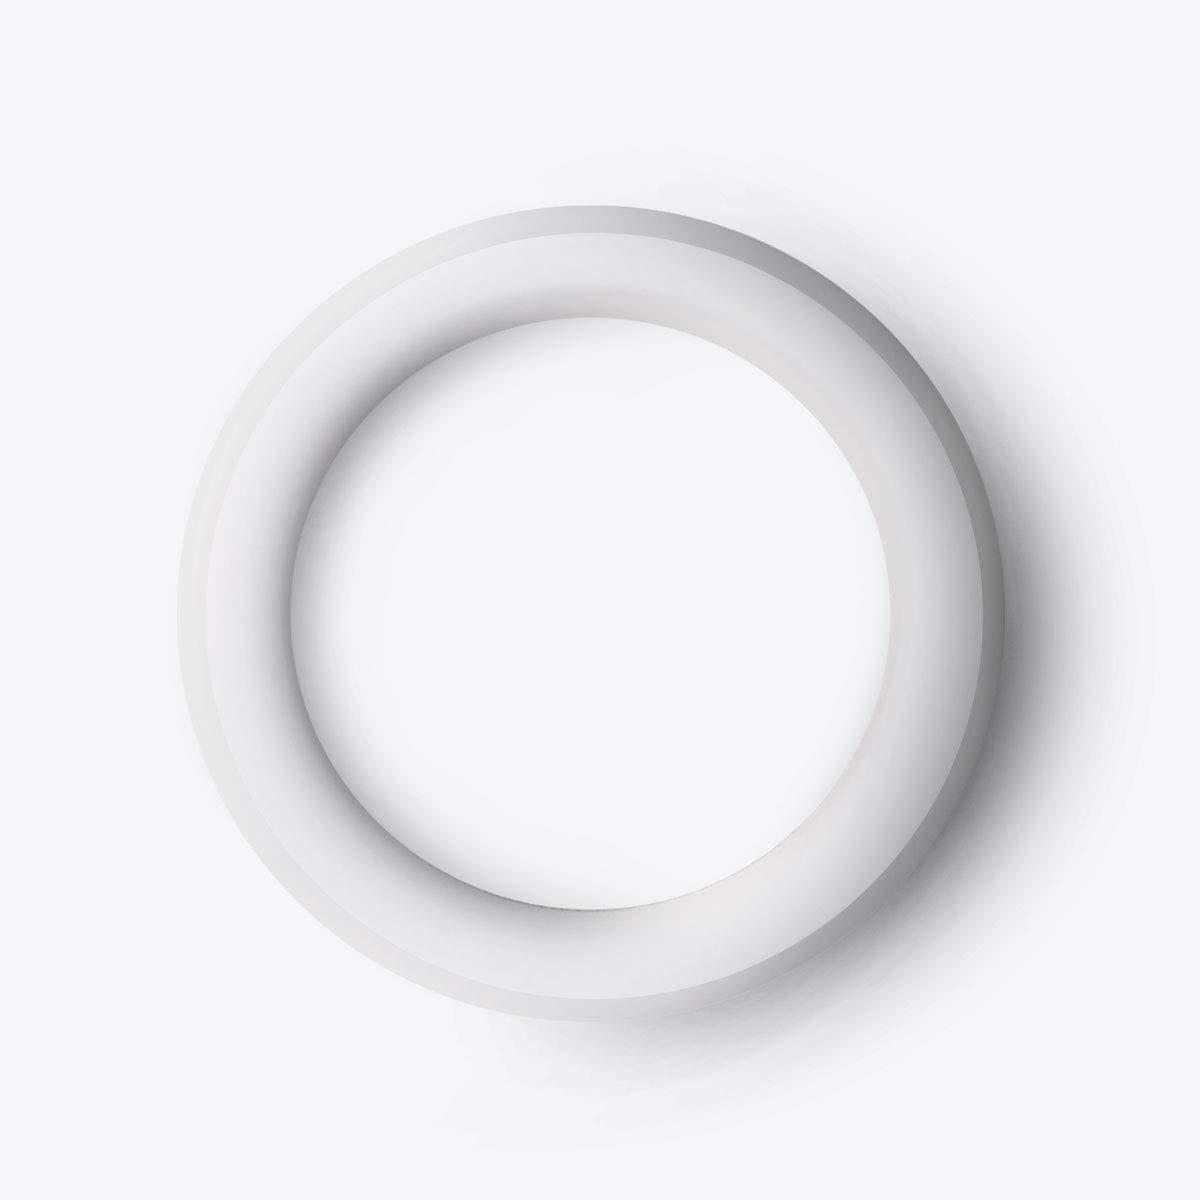 CAPO12 - Anillo reductor N°006 compatible con la SilverCrest Lidl: Amazon.es: Hogar